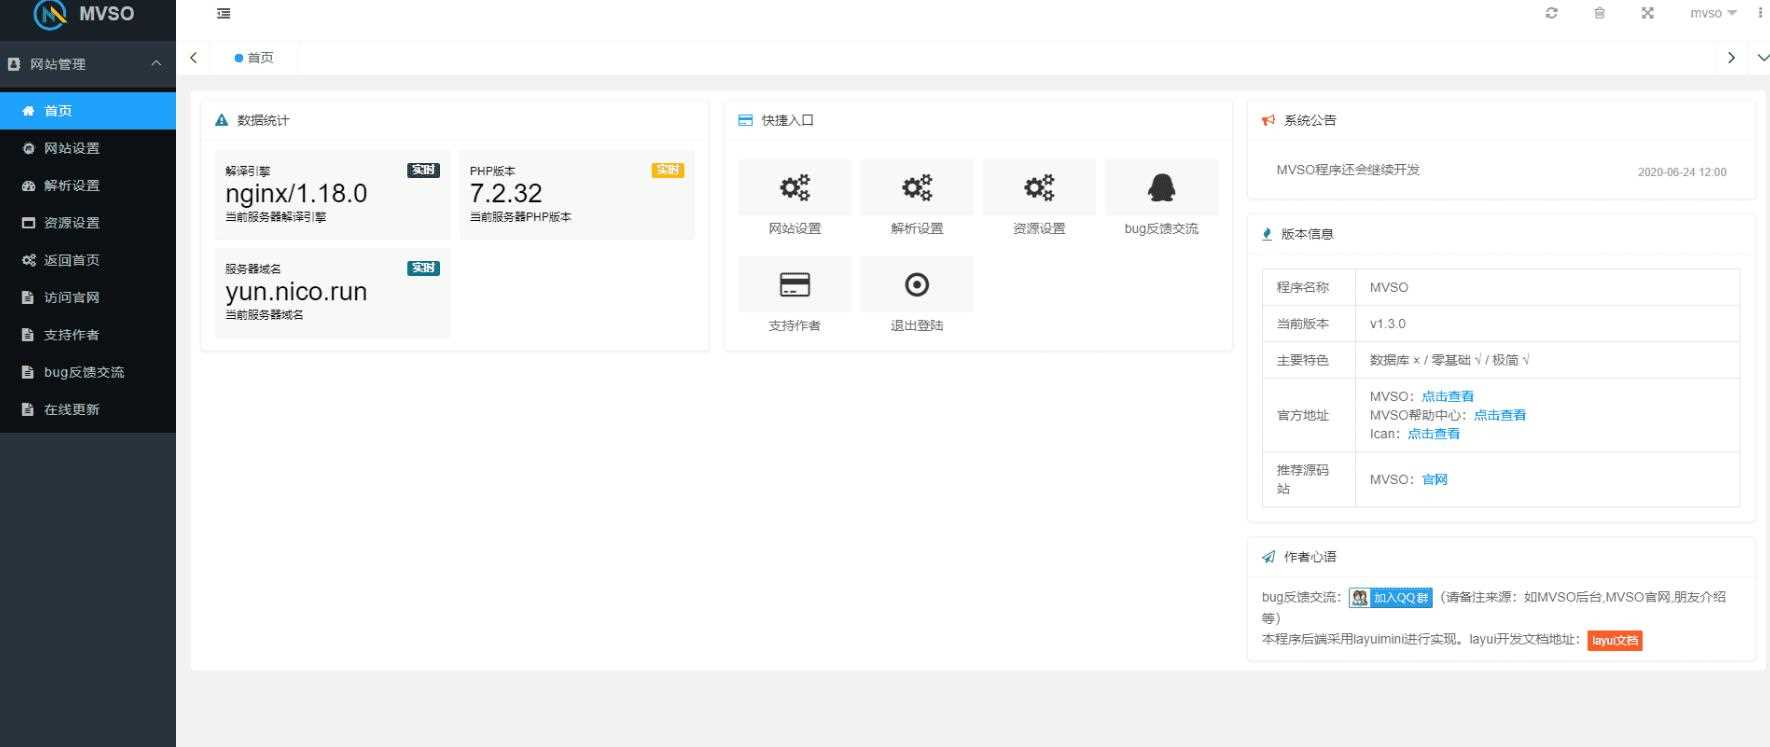 MVSO影视程序源码,影视自动采集+魔改超强SEO+自定义苹果cms资源站接口 精品源码 第2张